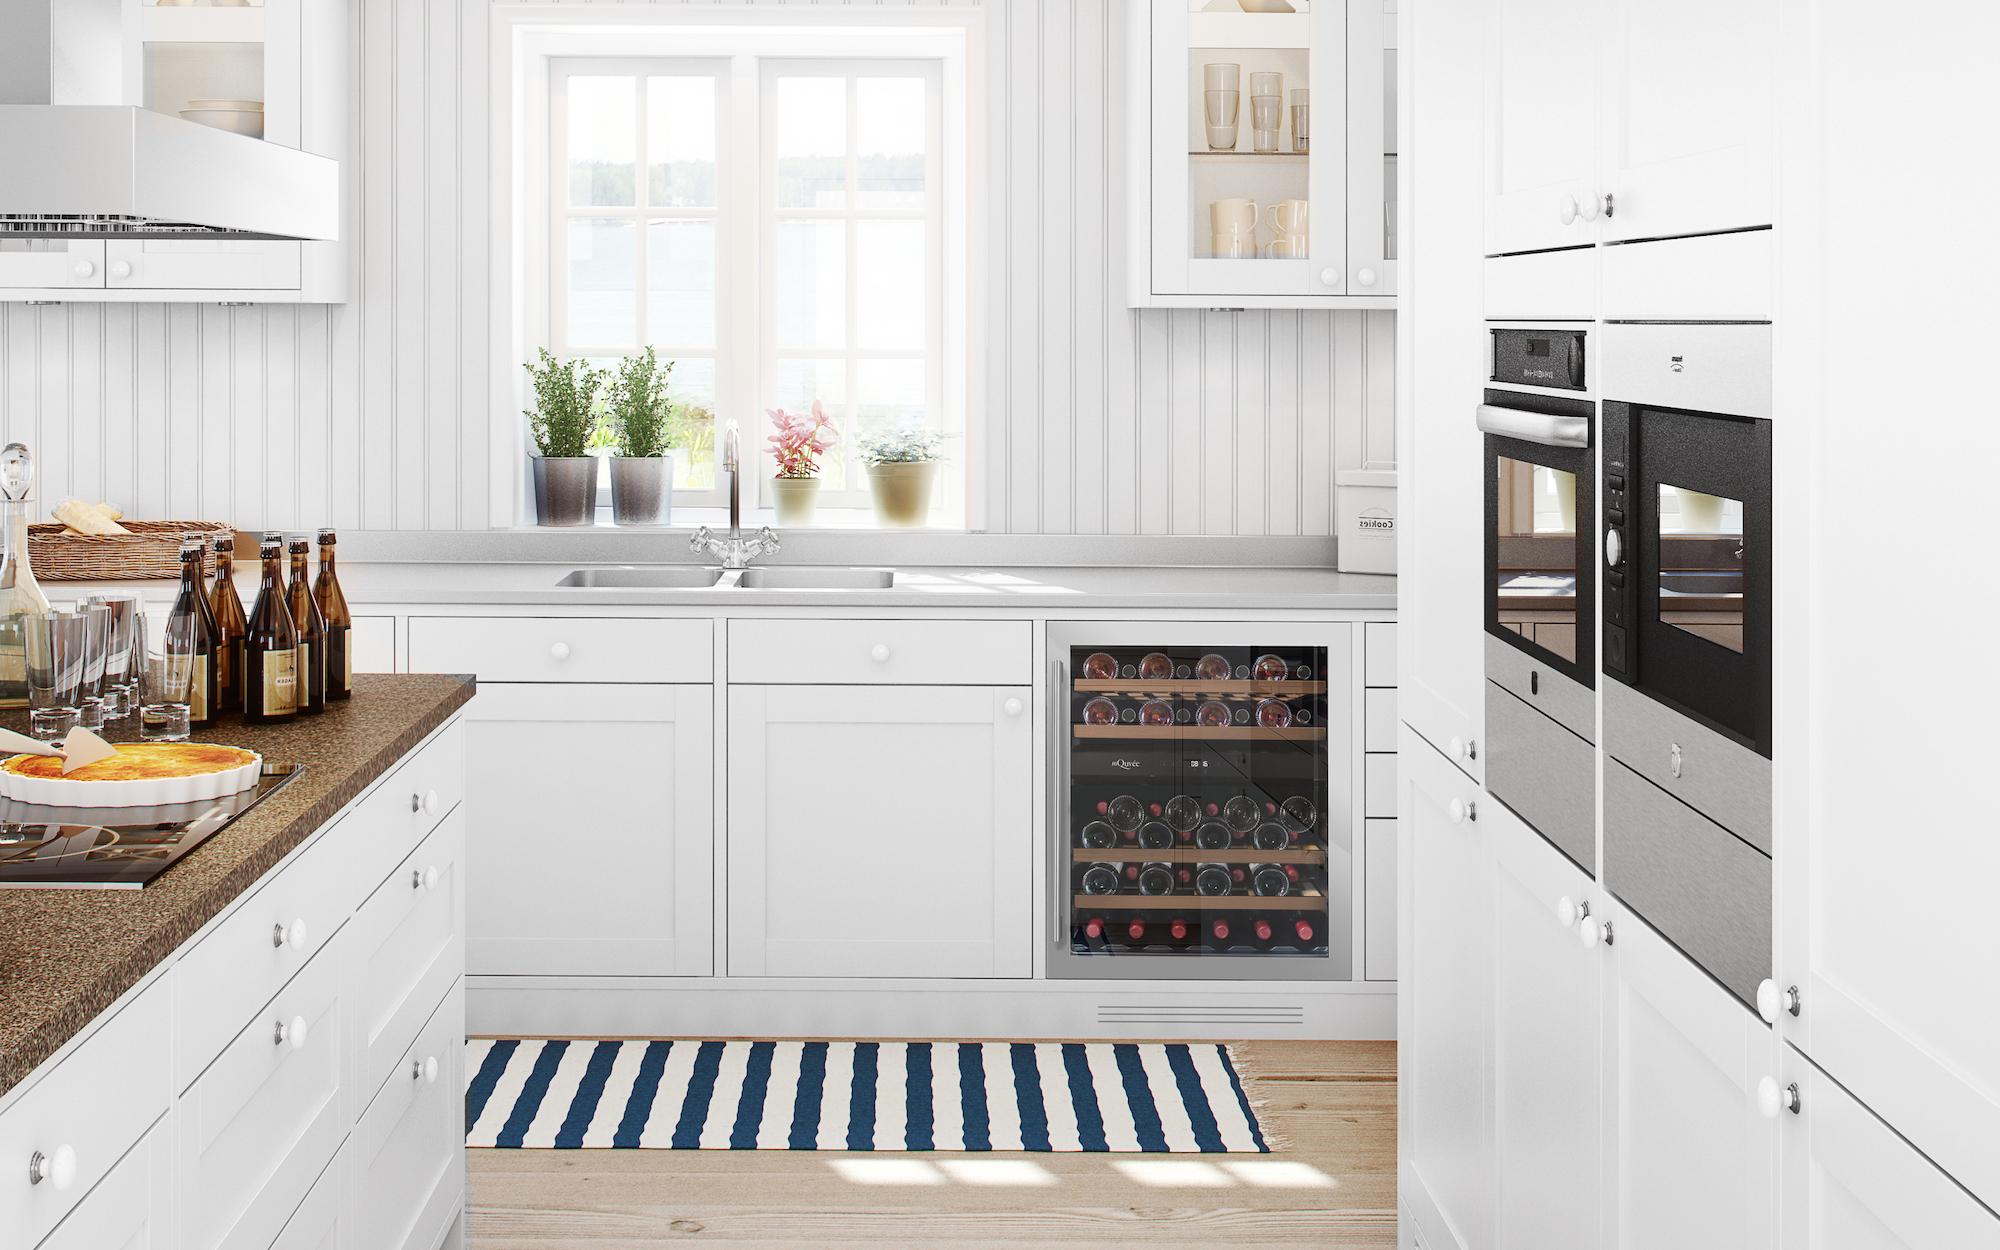 Inbyggbar vinkyl med unik dörr i köksmiljö